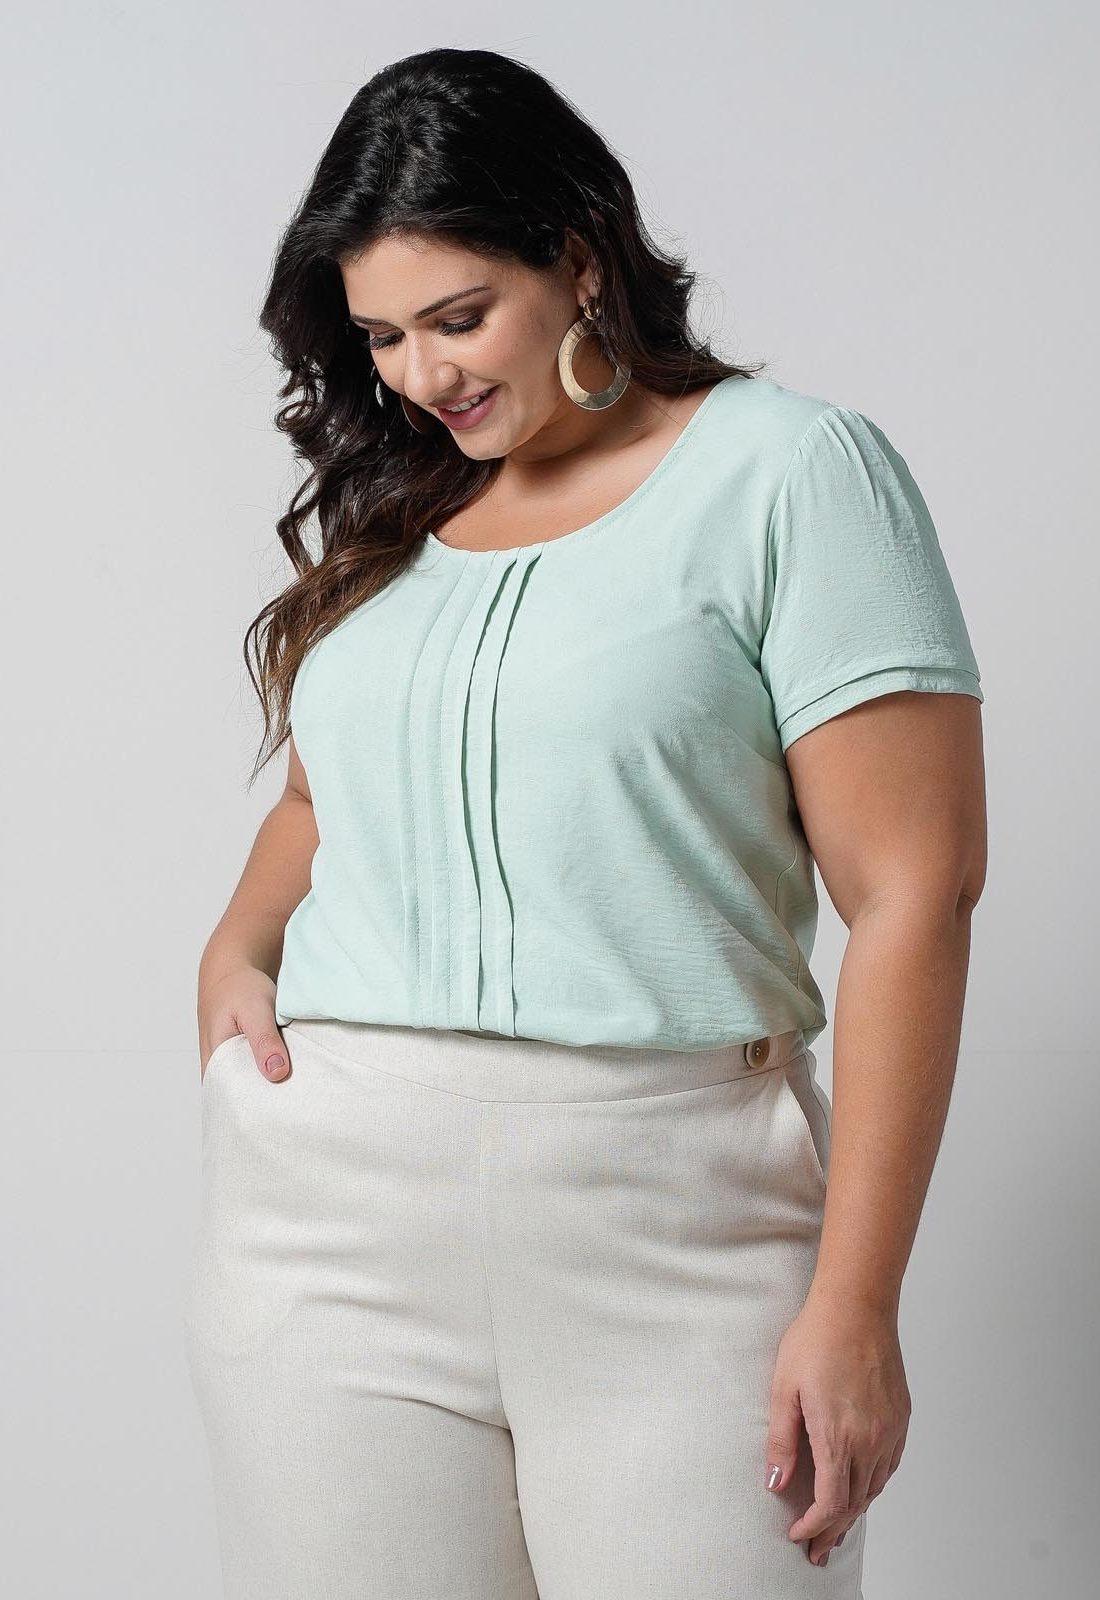 Blusa verde maquinetada poá plus size  Ref. U65821